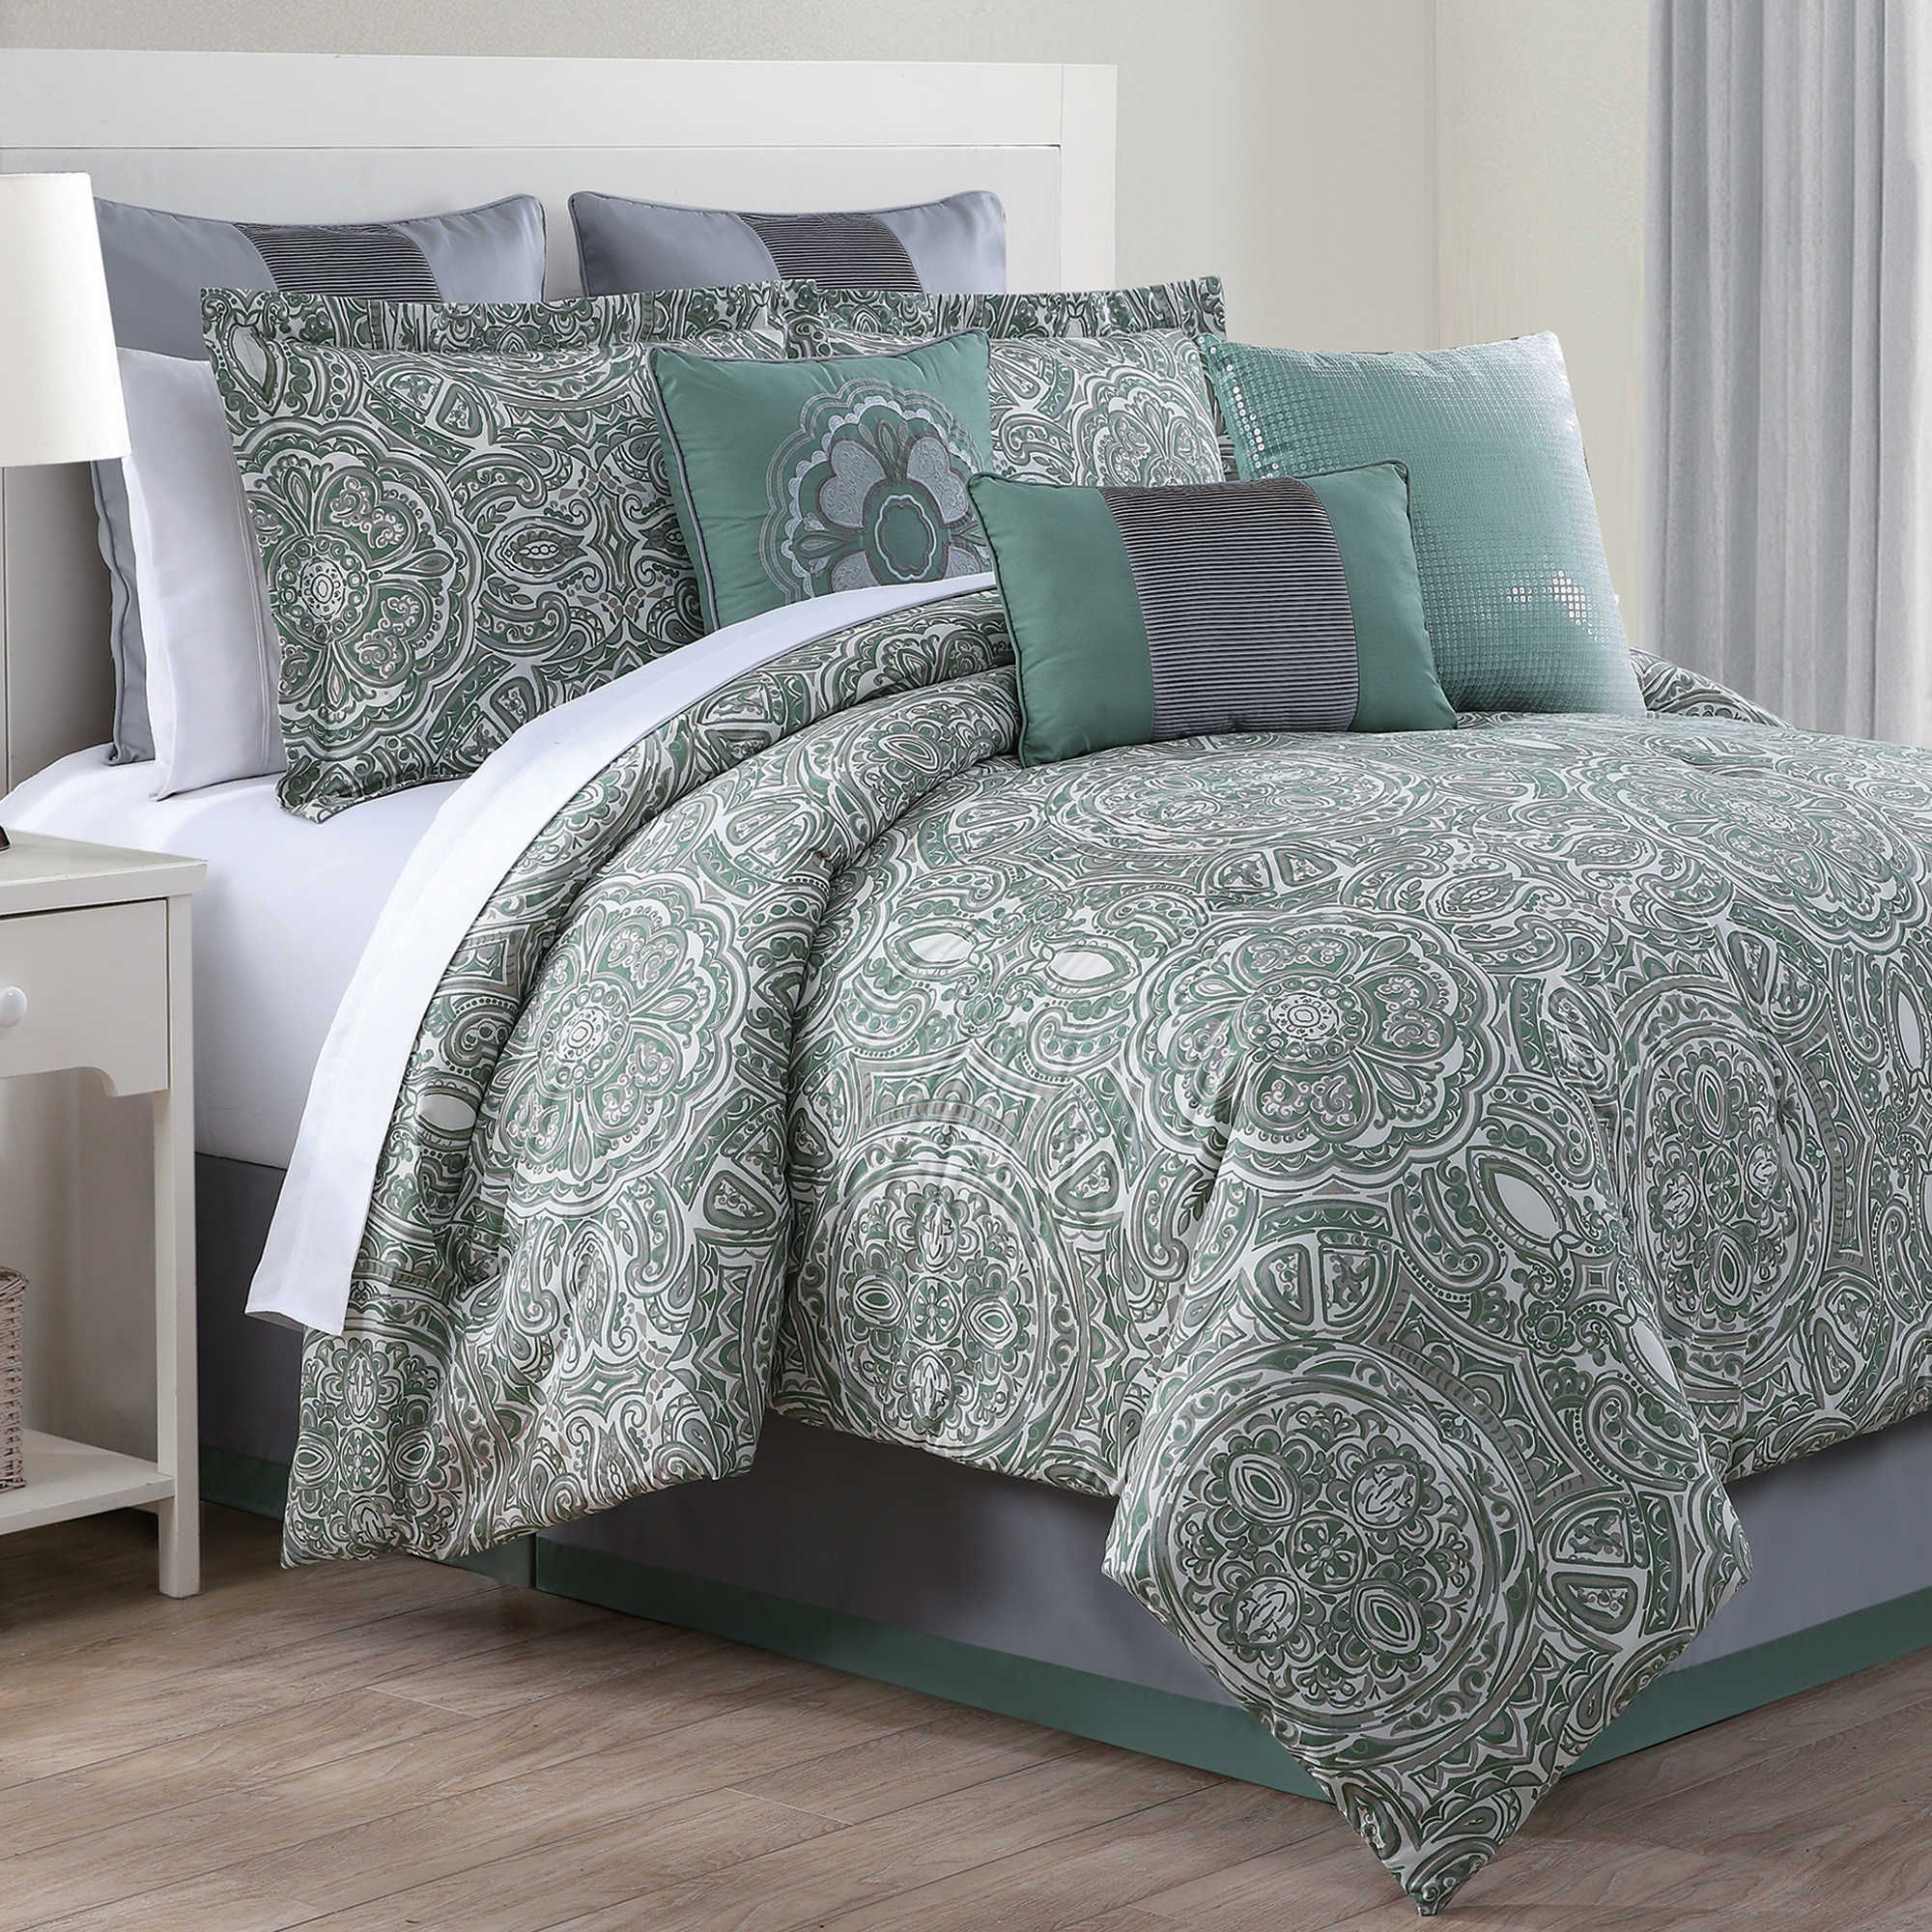 Green Bedding Sets King Size.Clara 9 Piece Comforter Set In Green Grey Bed Comforter